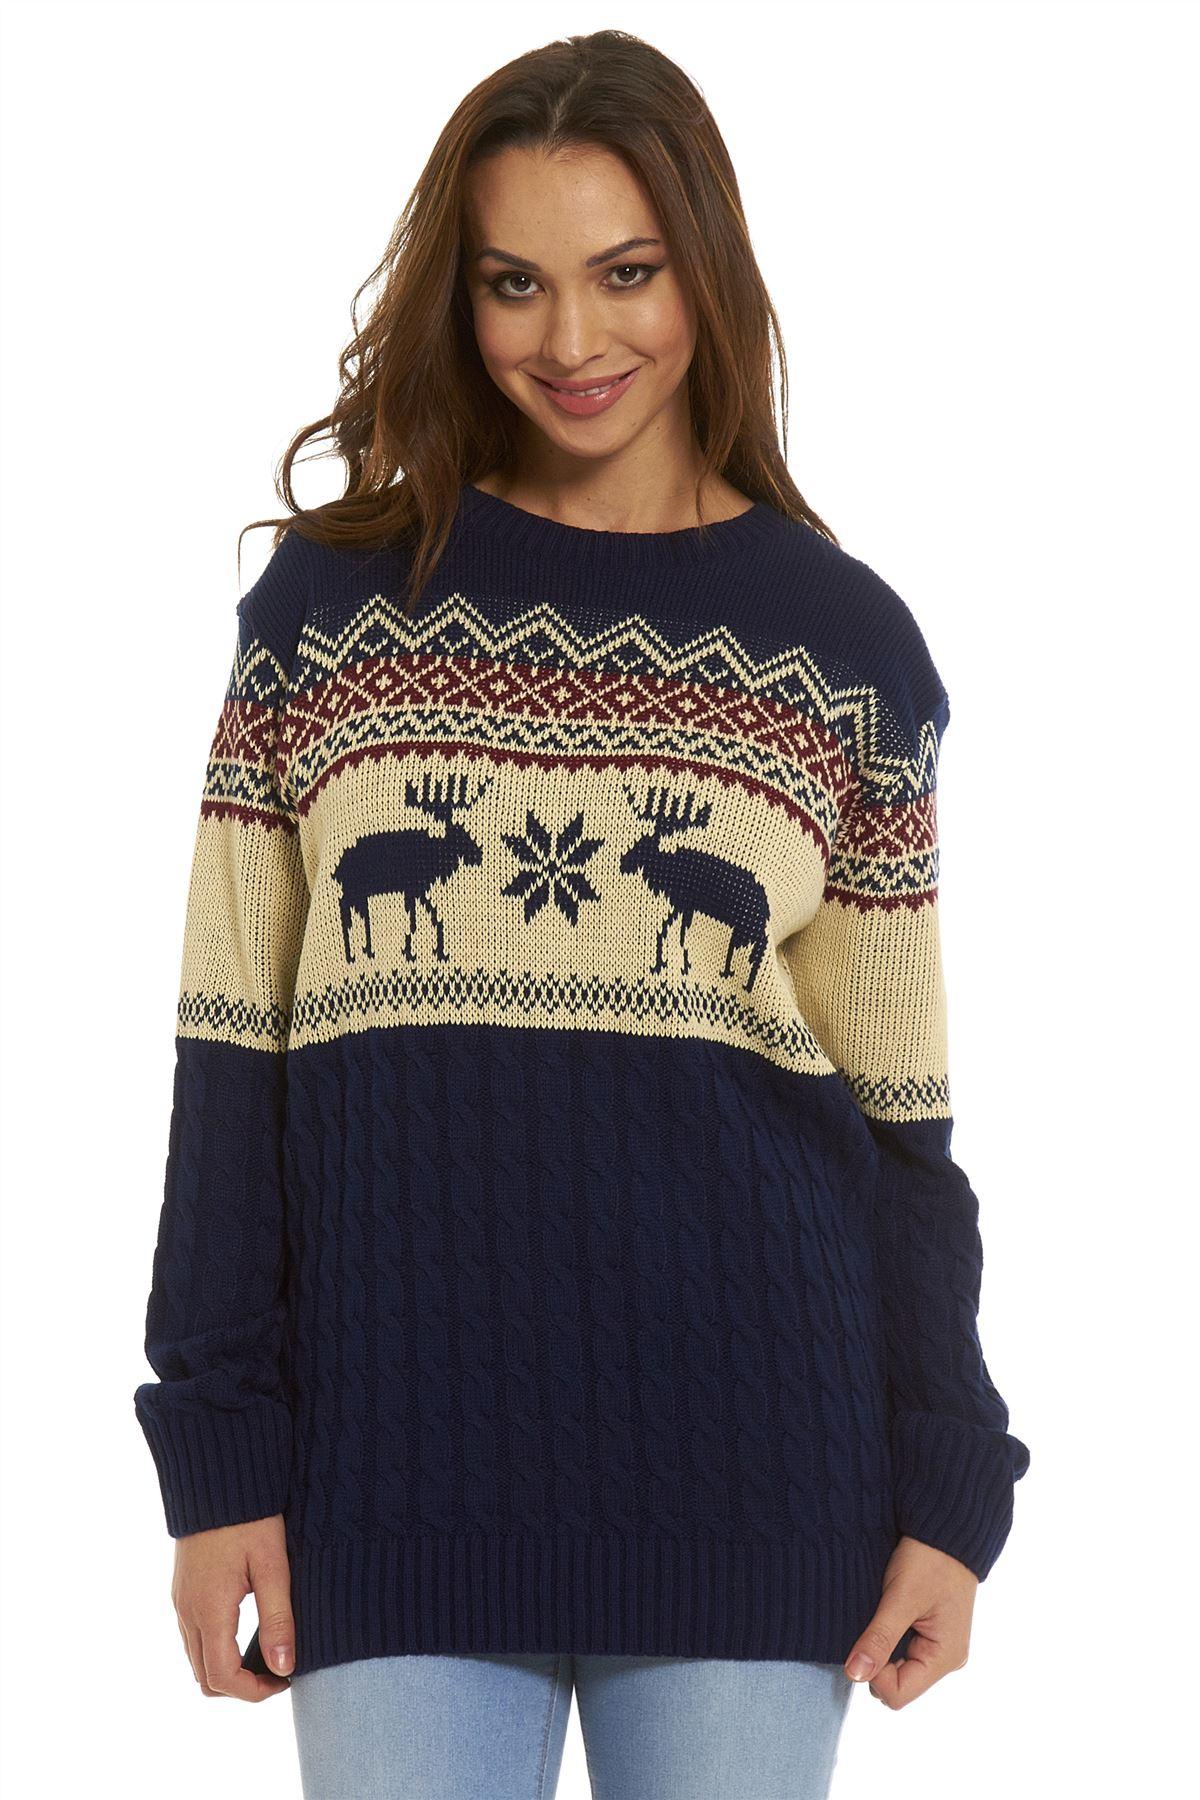 Xmas Ladies Mens Novelty Christmas Sweater Retro Vintage ...